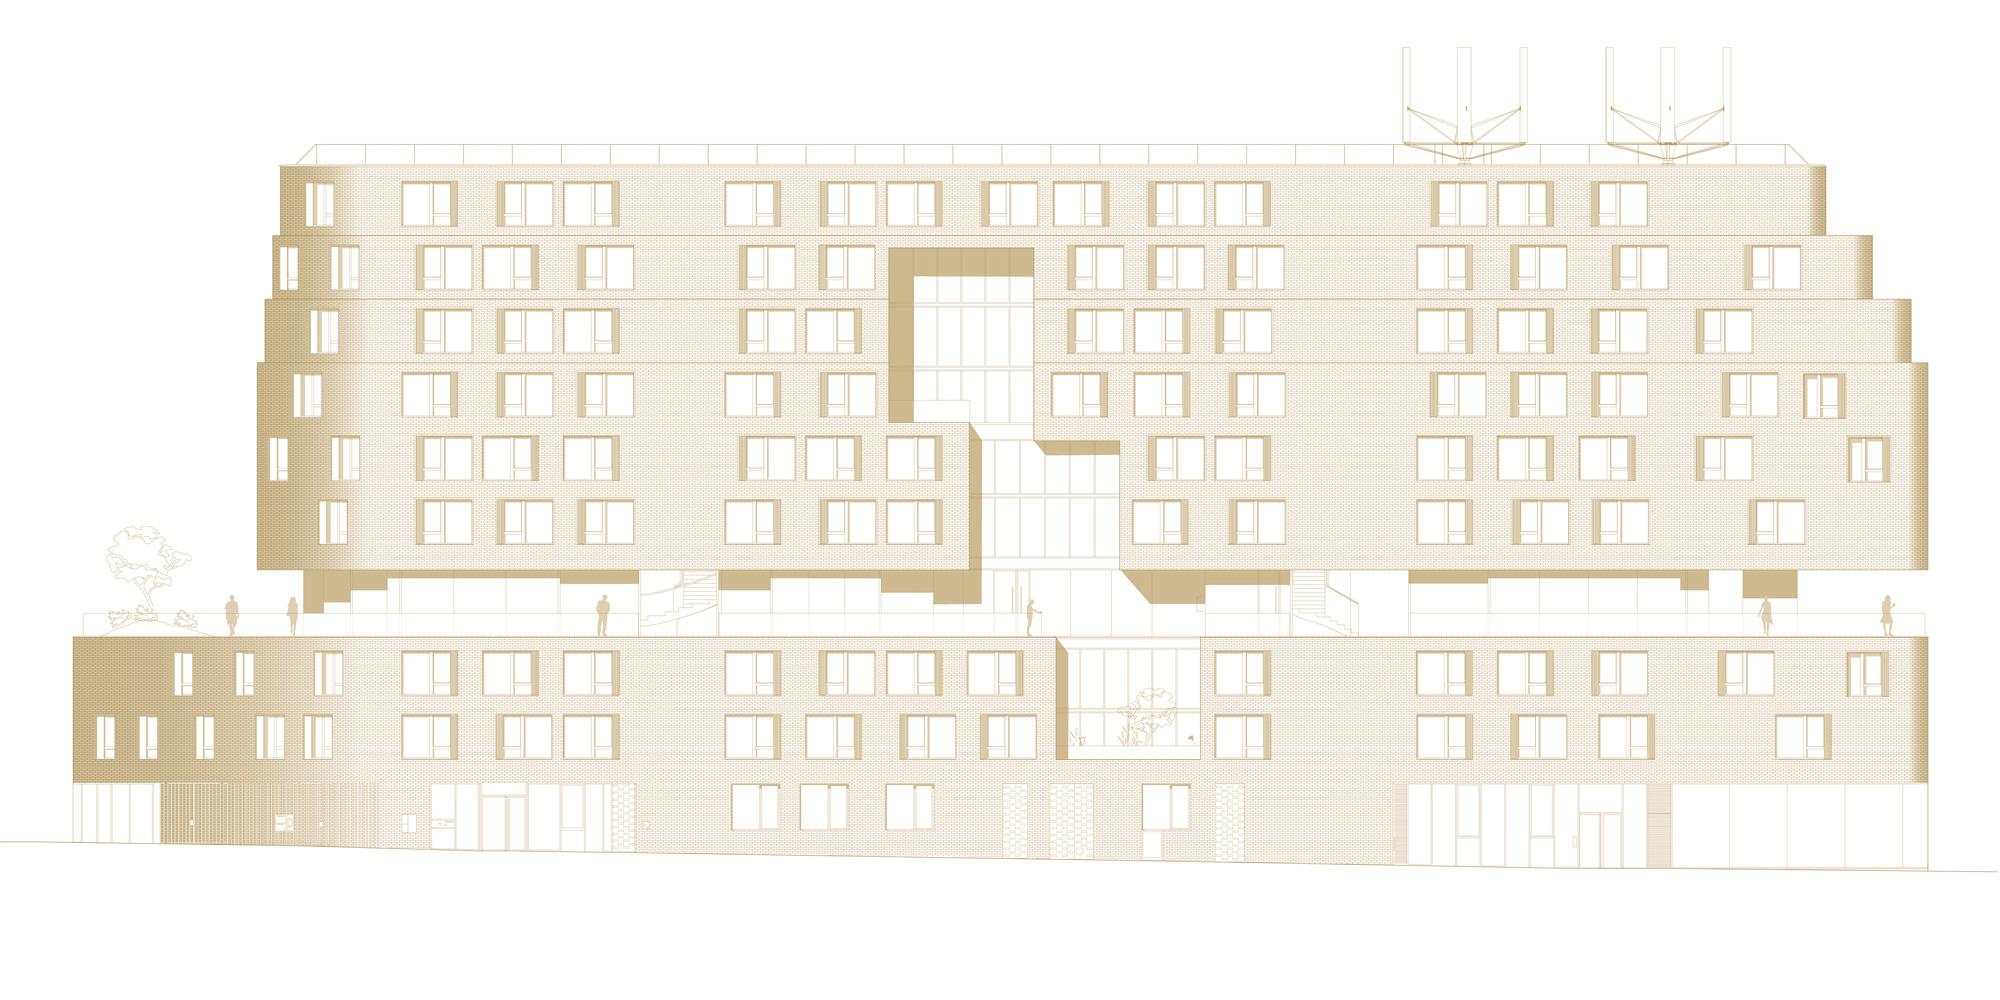 North Elevation © Avenier Cornejo Architectes